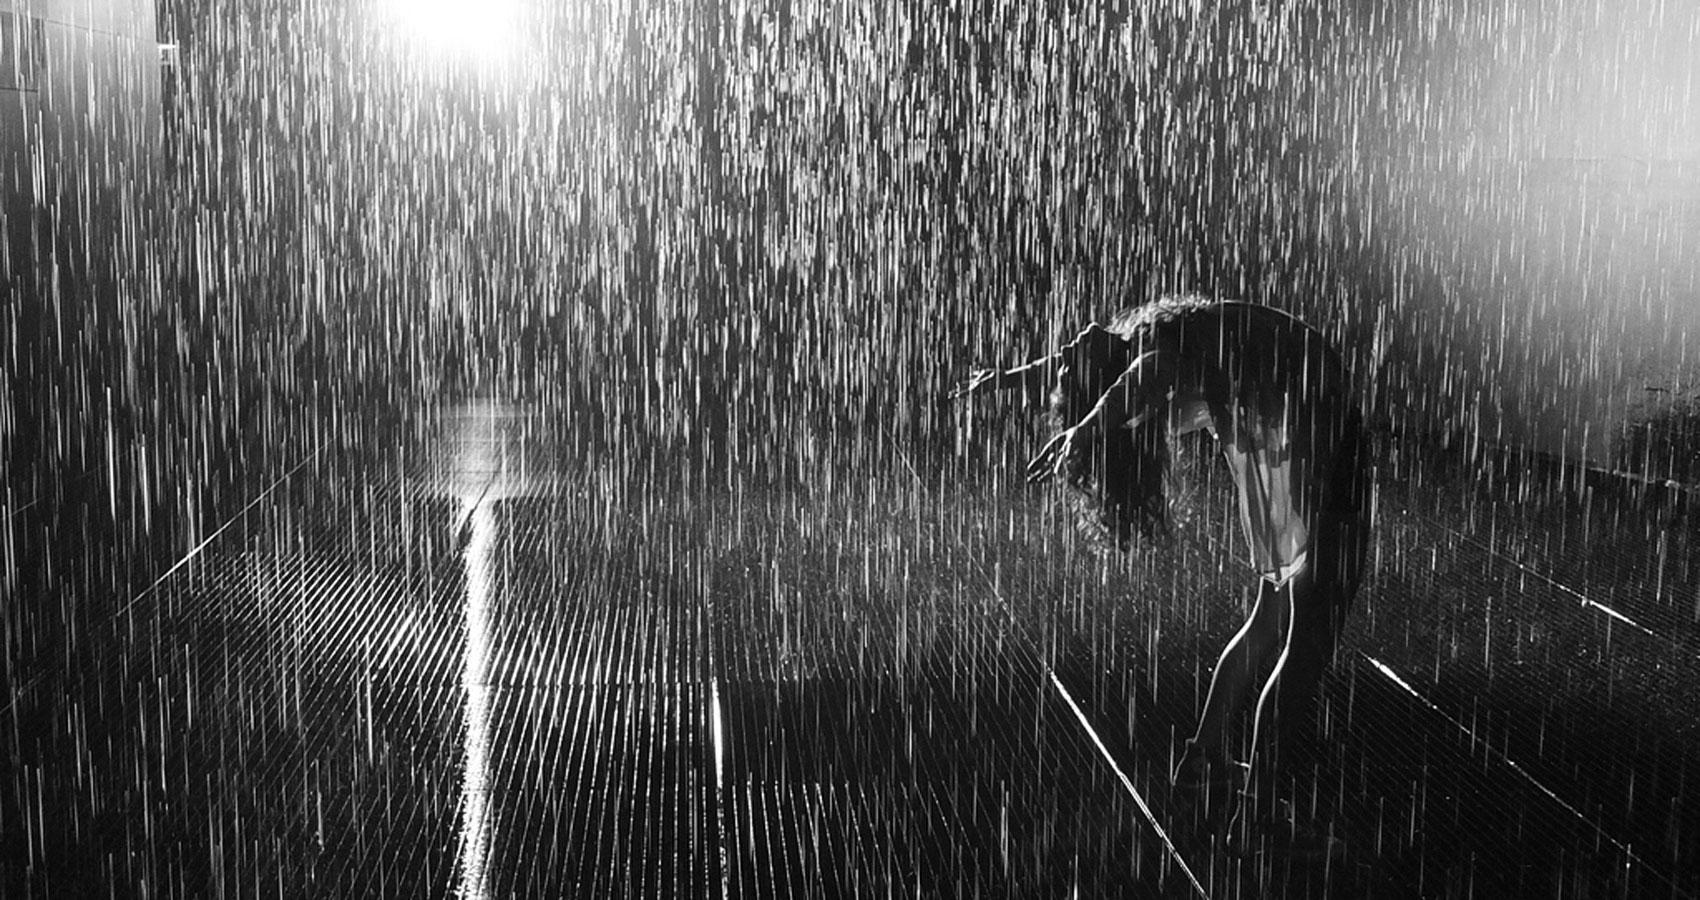 First Fall Rain written by TM Arko at Spillwords.com